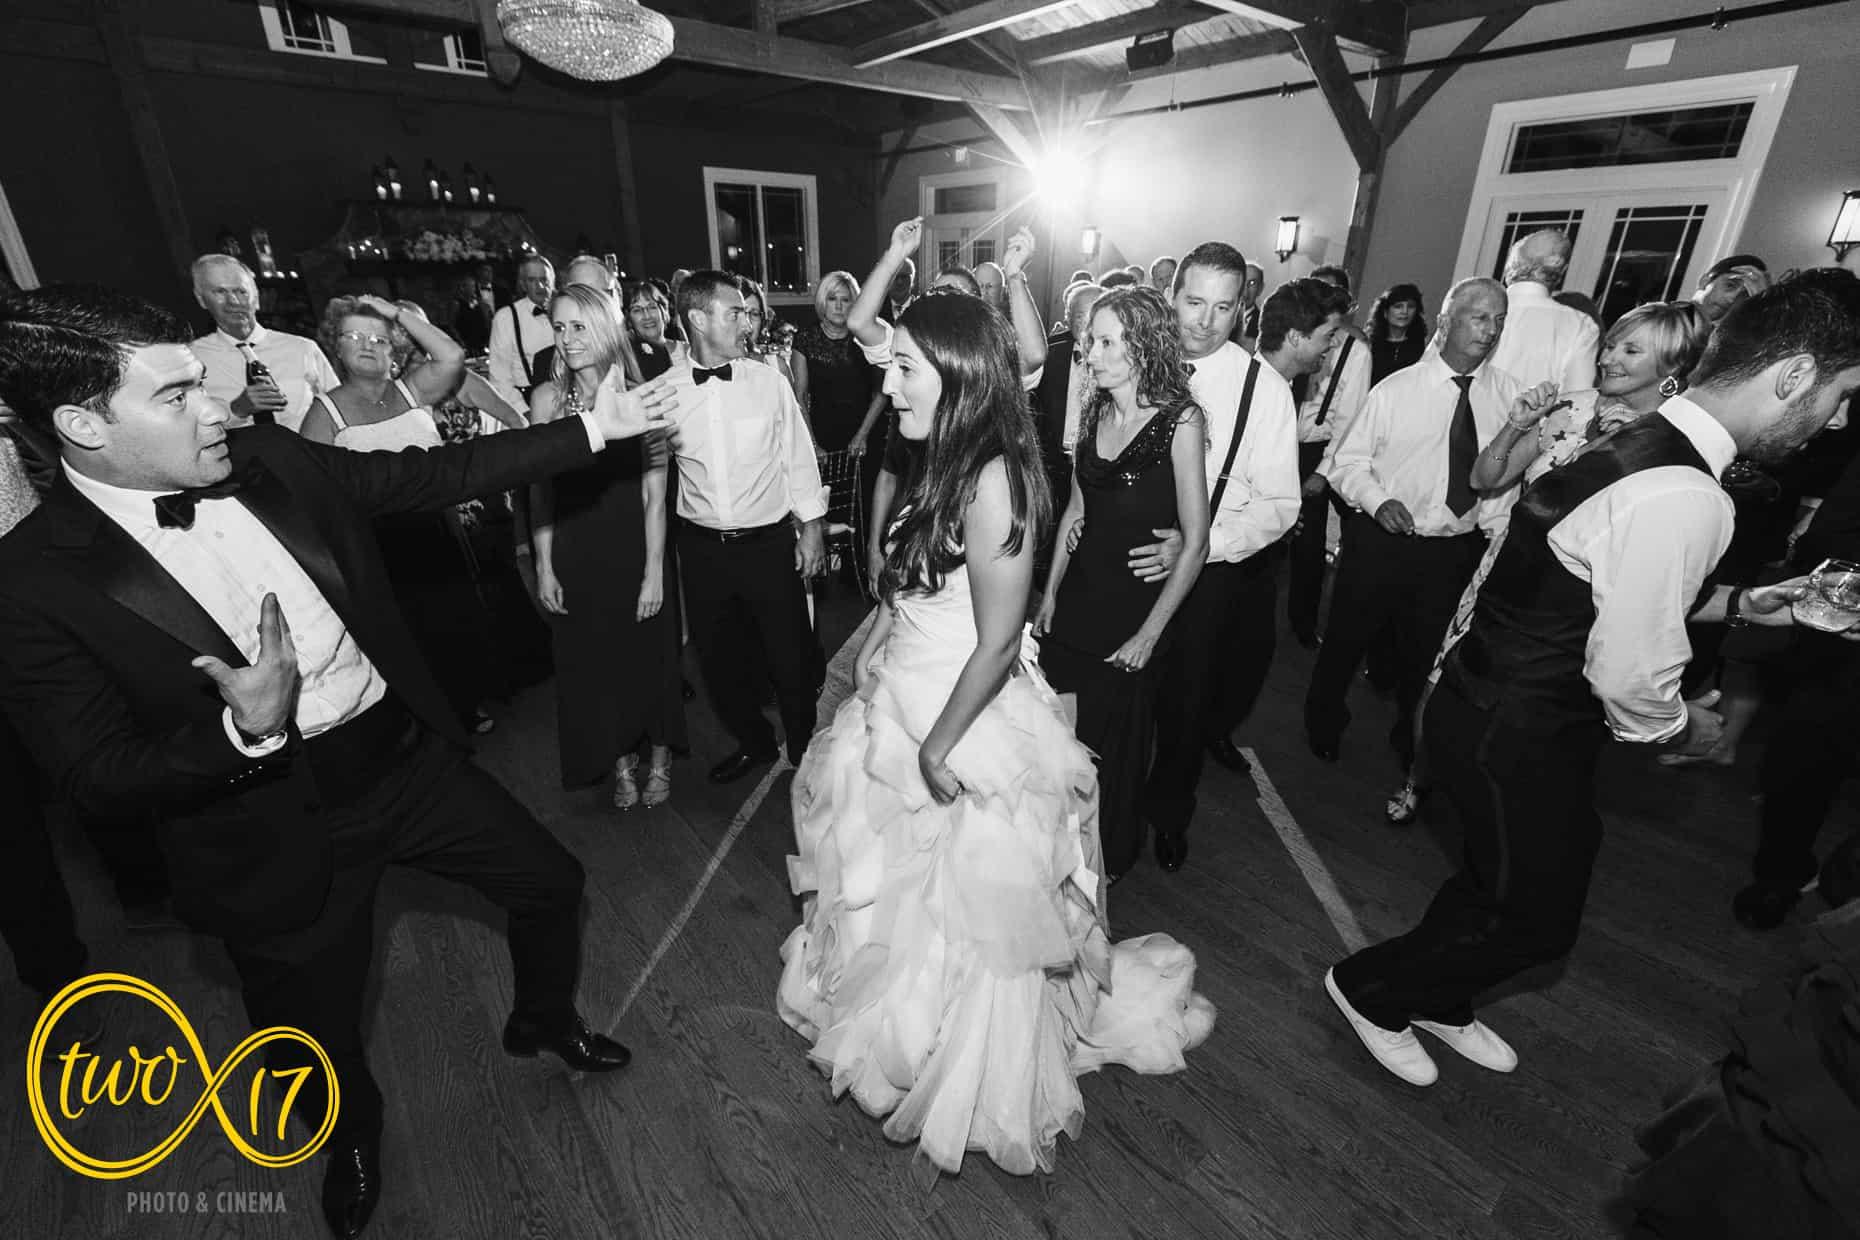 Kristen Barse BelMomento Wedding photos